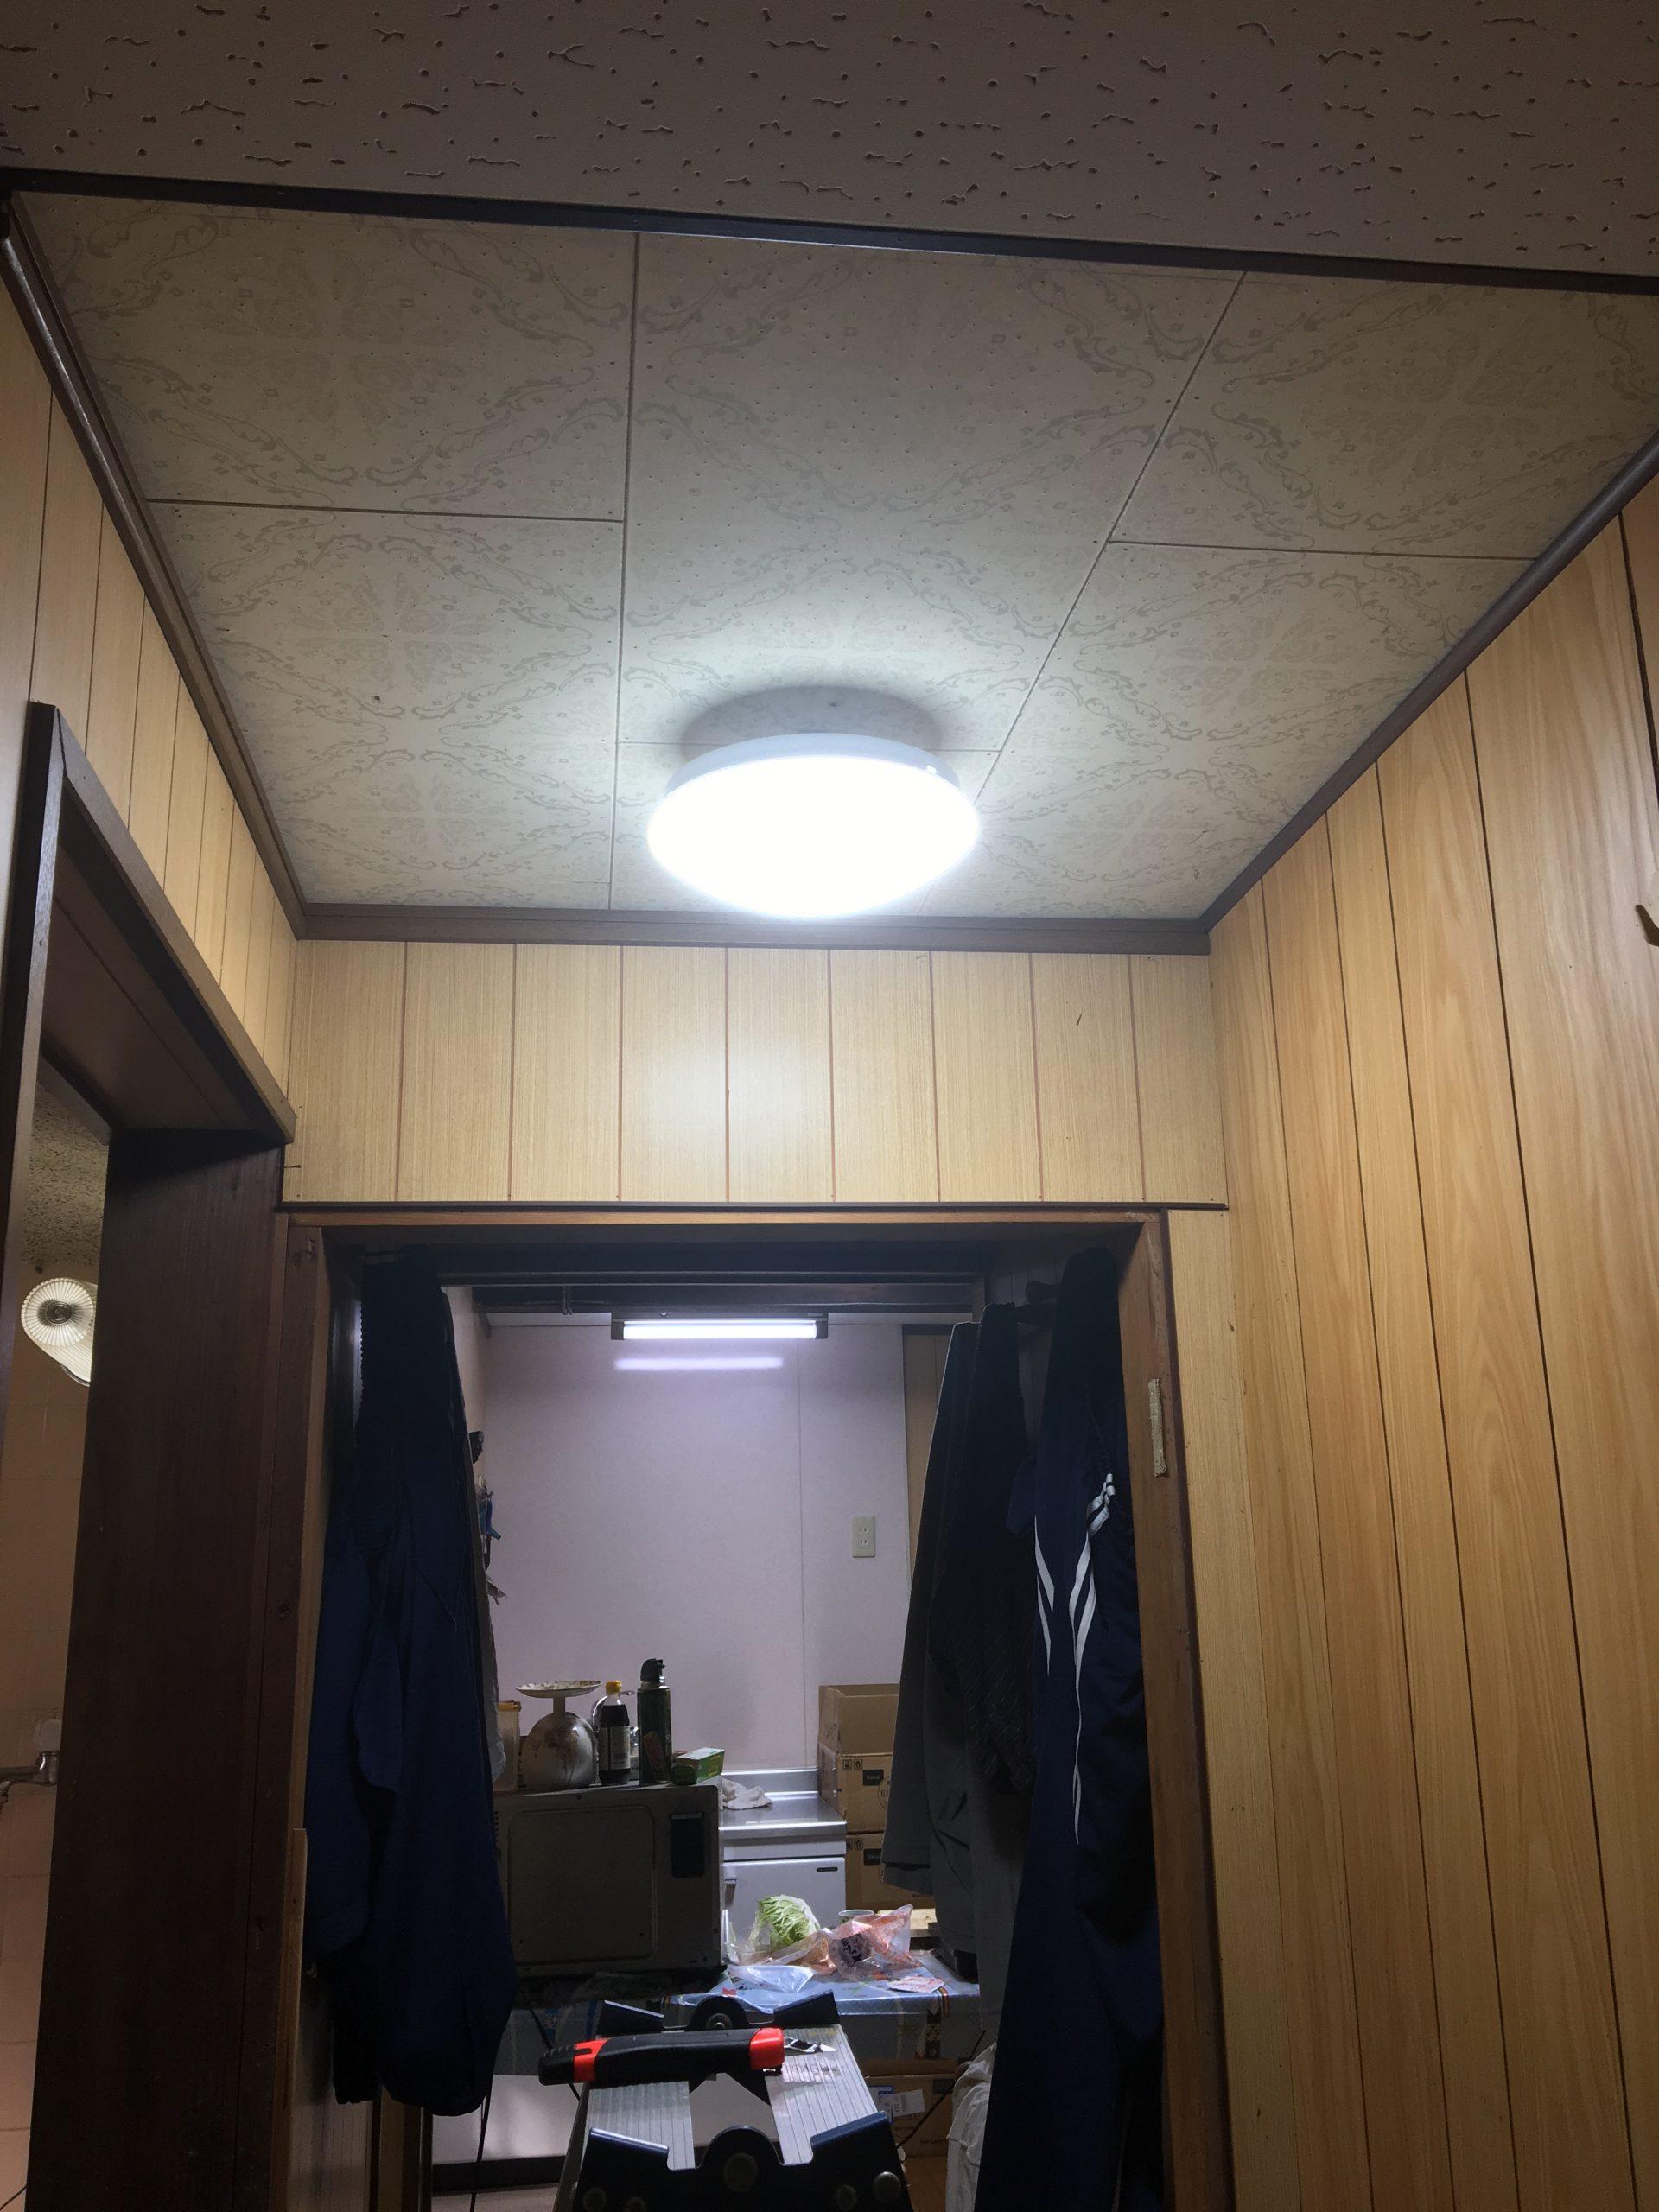 滋賀県近江八幡市の電気工事(照明交換)作業【ご依頼】